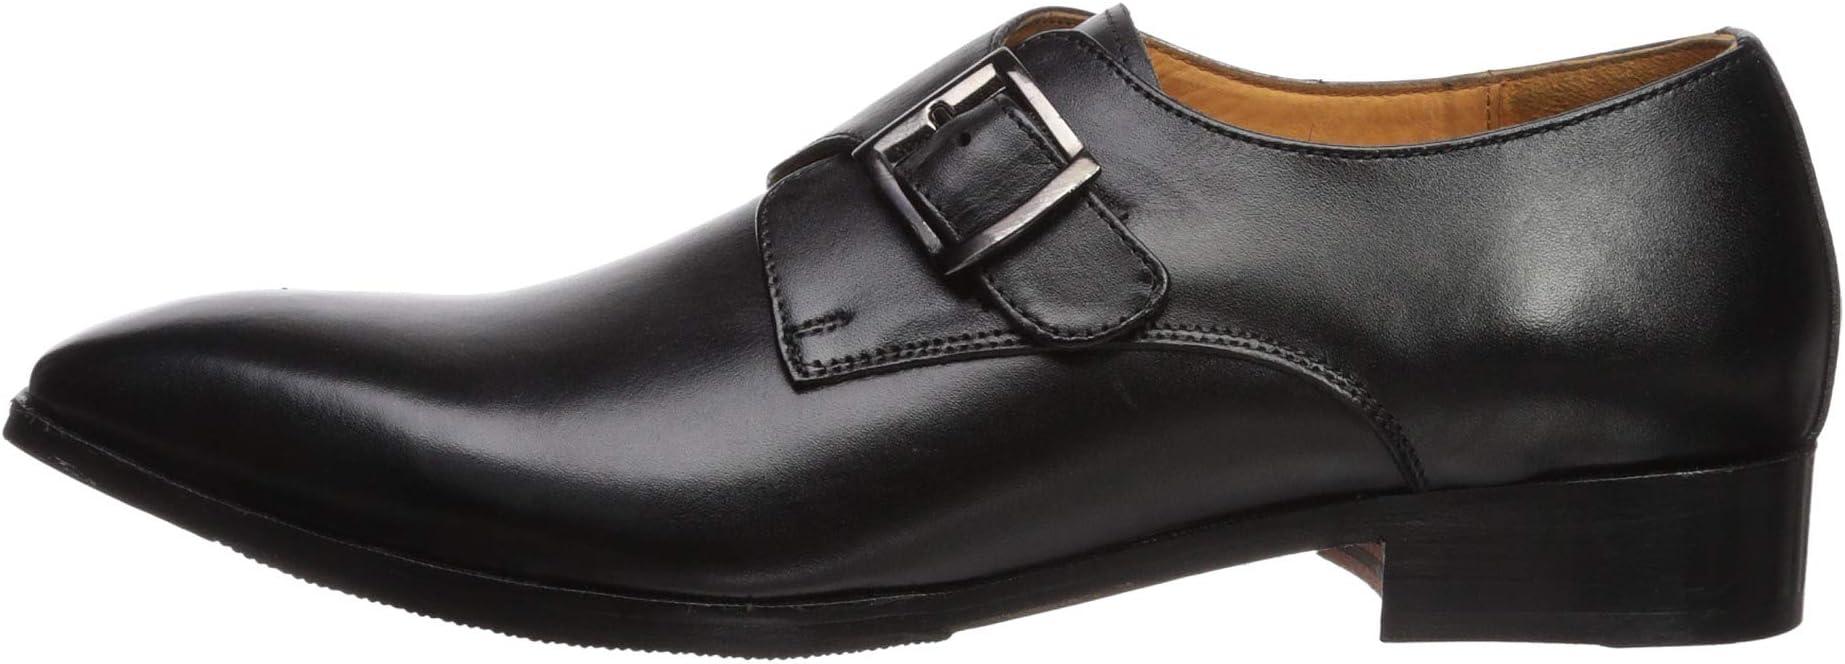 CARLOS by Carlos Santana Freedom Monk Single Strap | Men's shoes | 2020 Newest